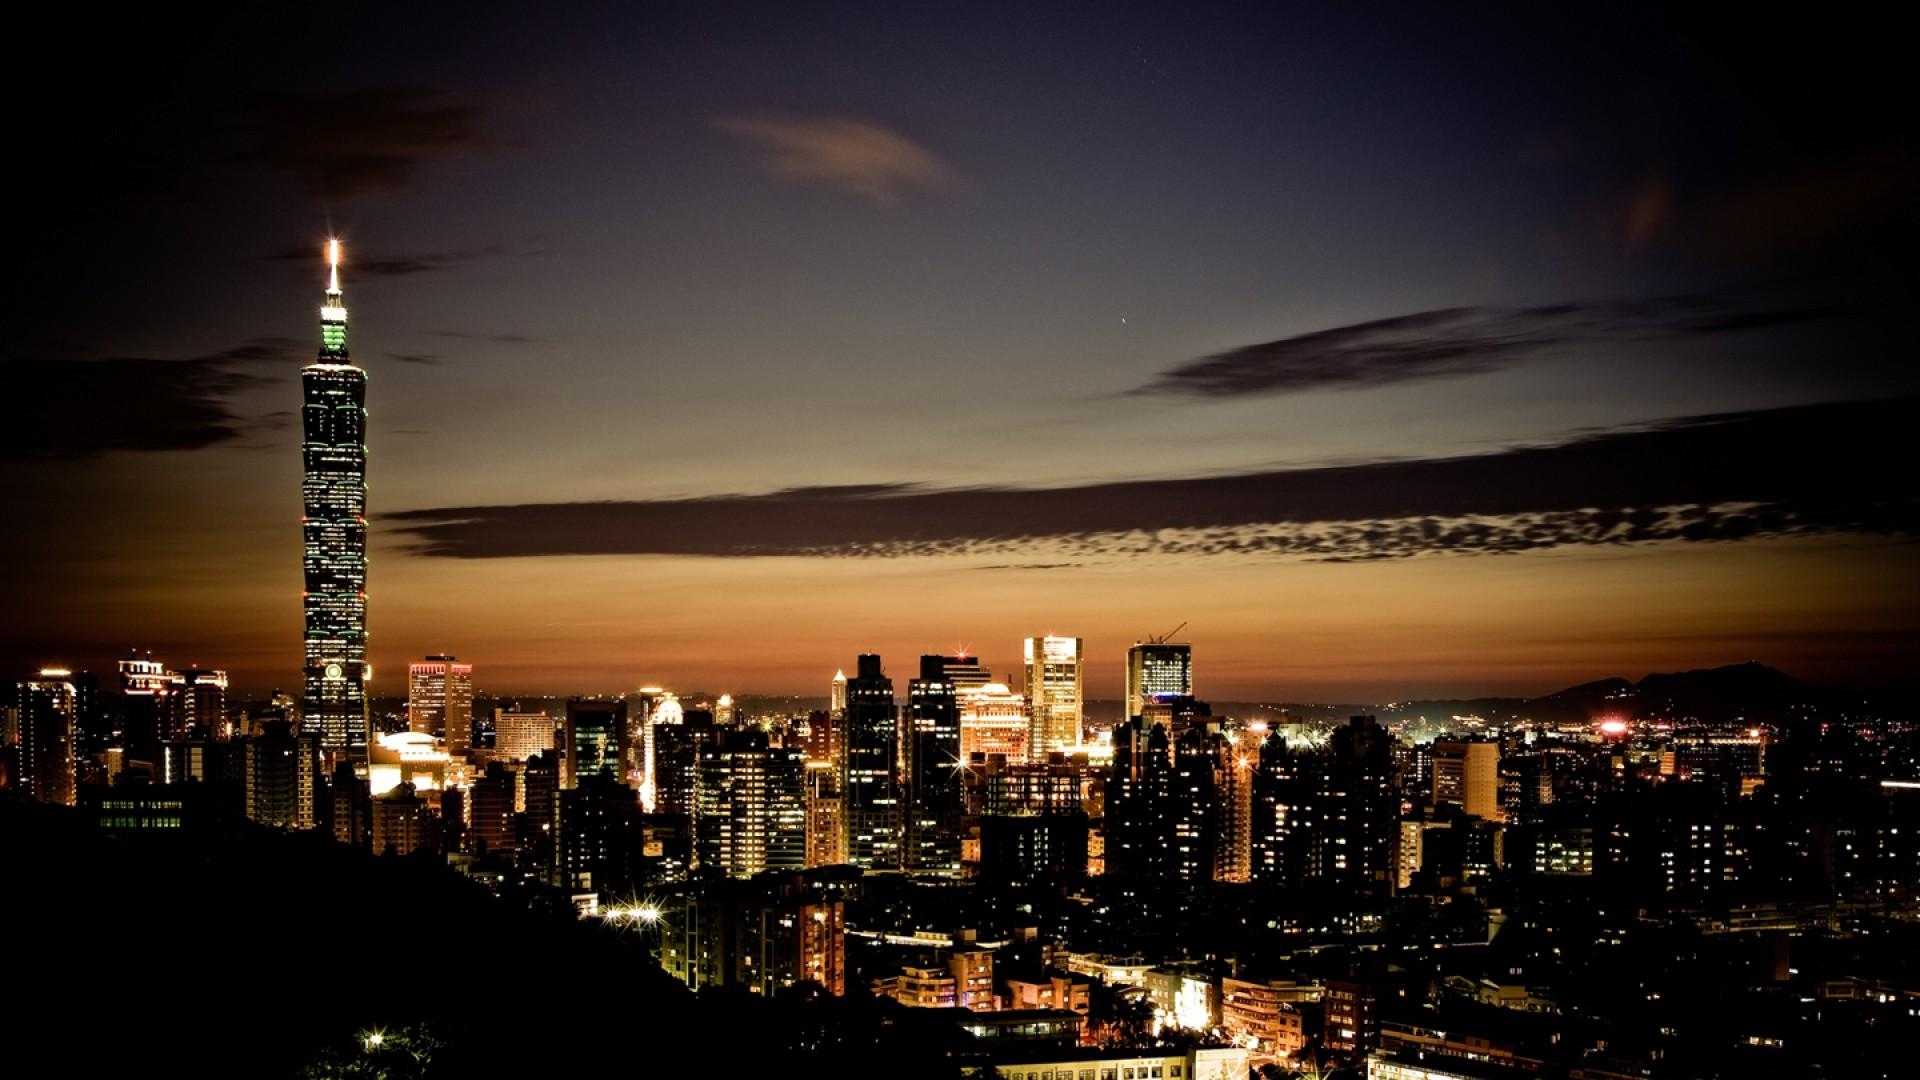 Download 'night time city wallpaper' HD wallpaper